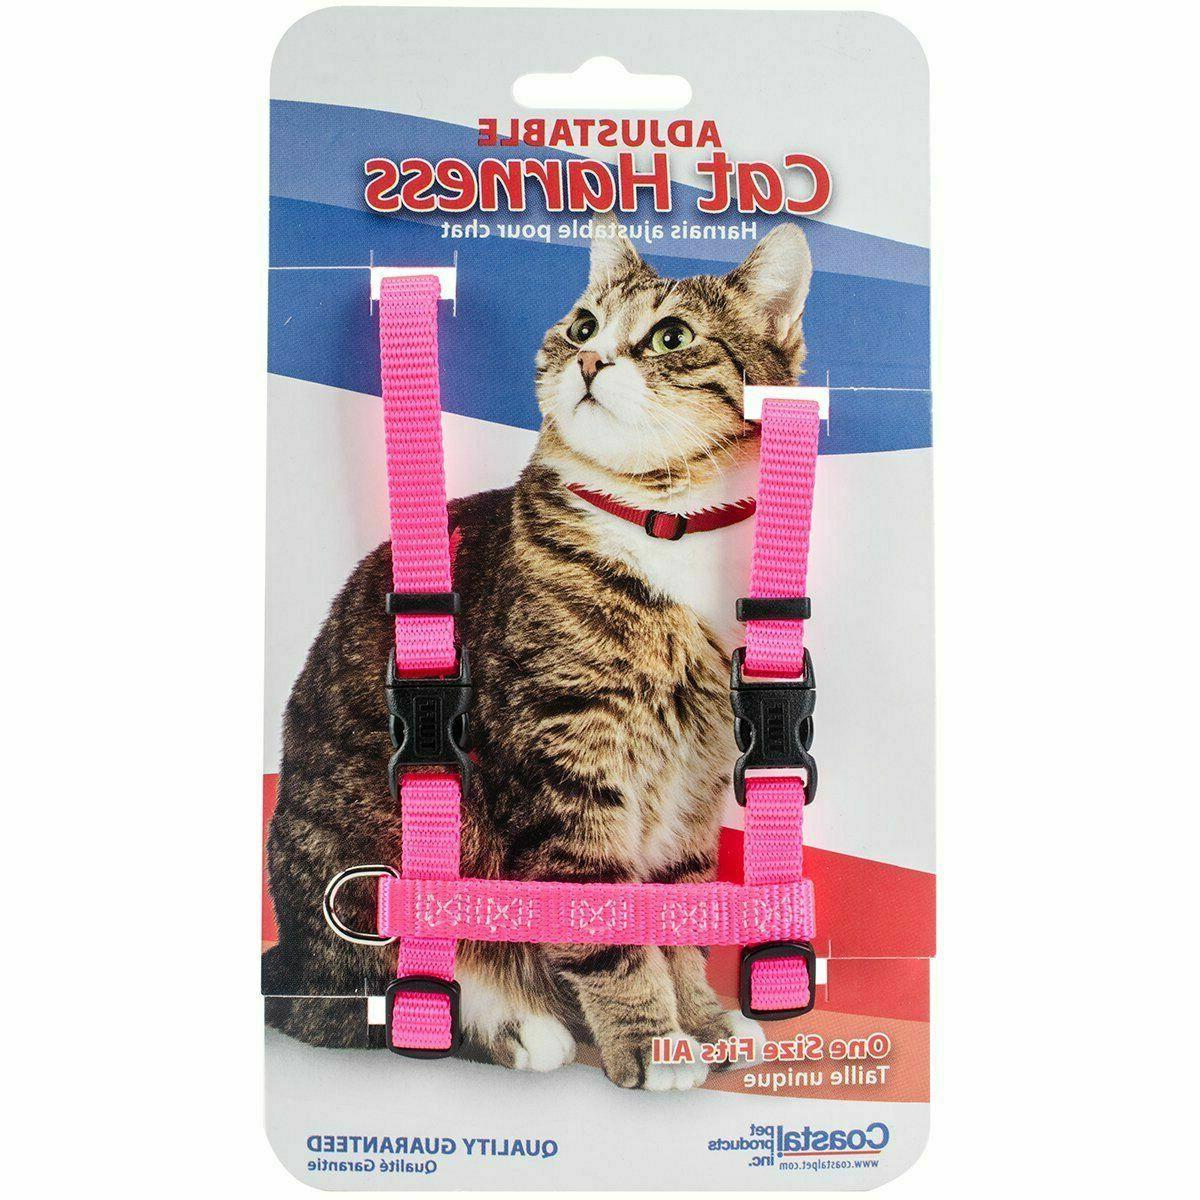 different colors adjustable figure h cat harness